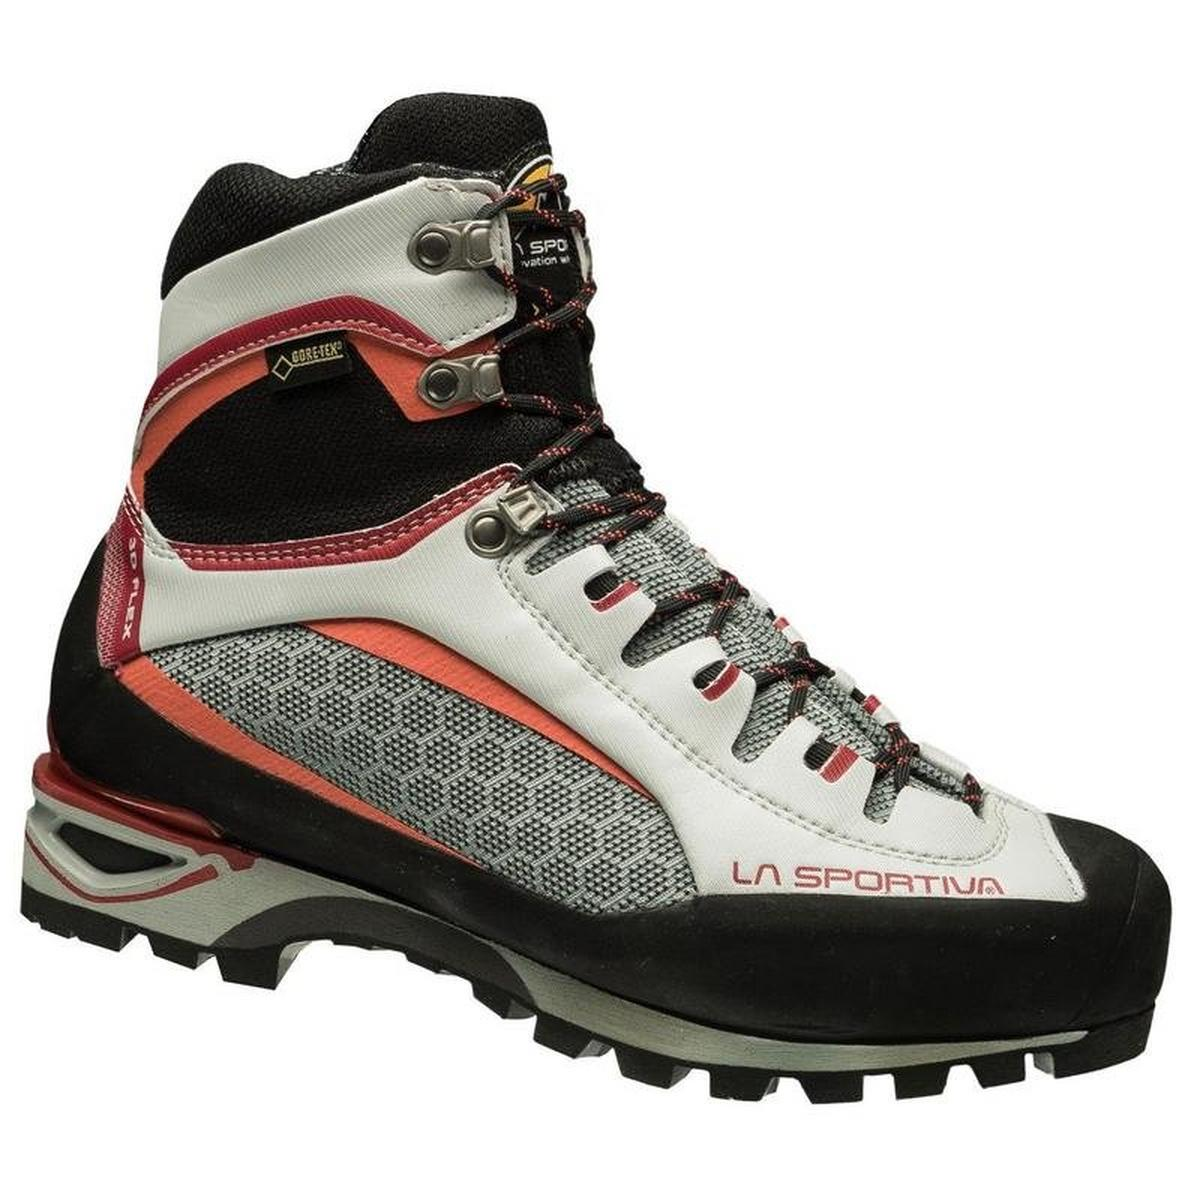 La Sportiva Boots Women's Trango Tower GTX Light Grey/Berry